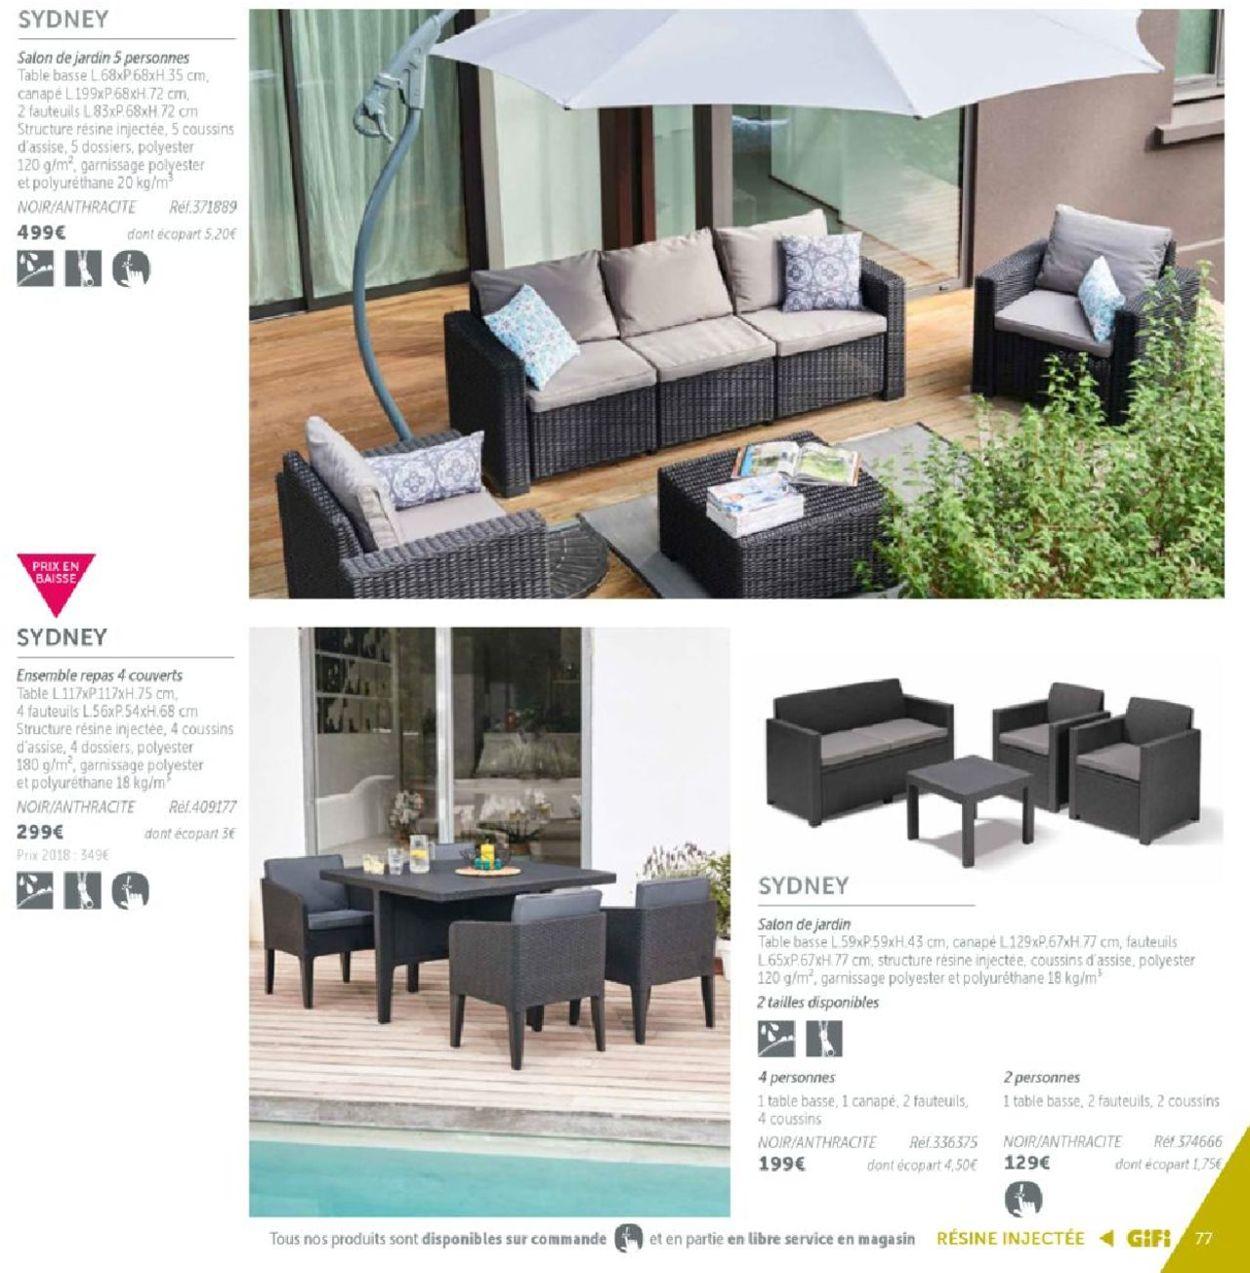 Gifi Catalogue Actuel 14.03 - 31.12.2019 [77] - Catalogue-24 tout Foir Fouille Salon De Jardin